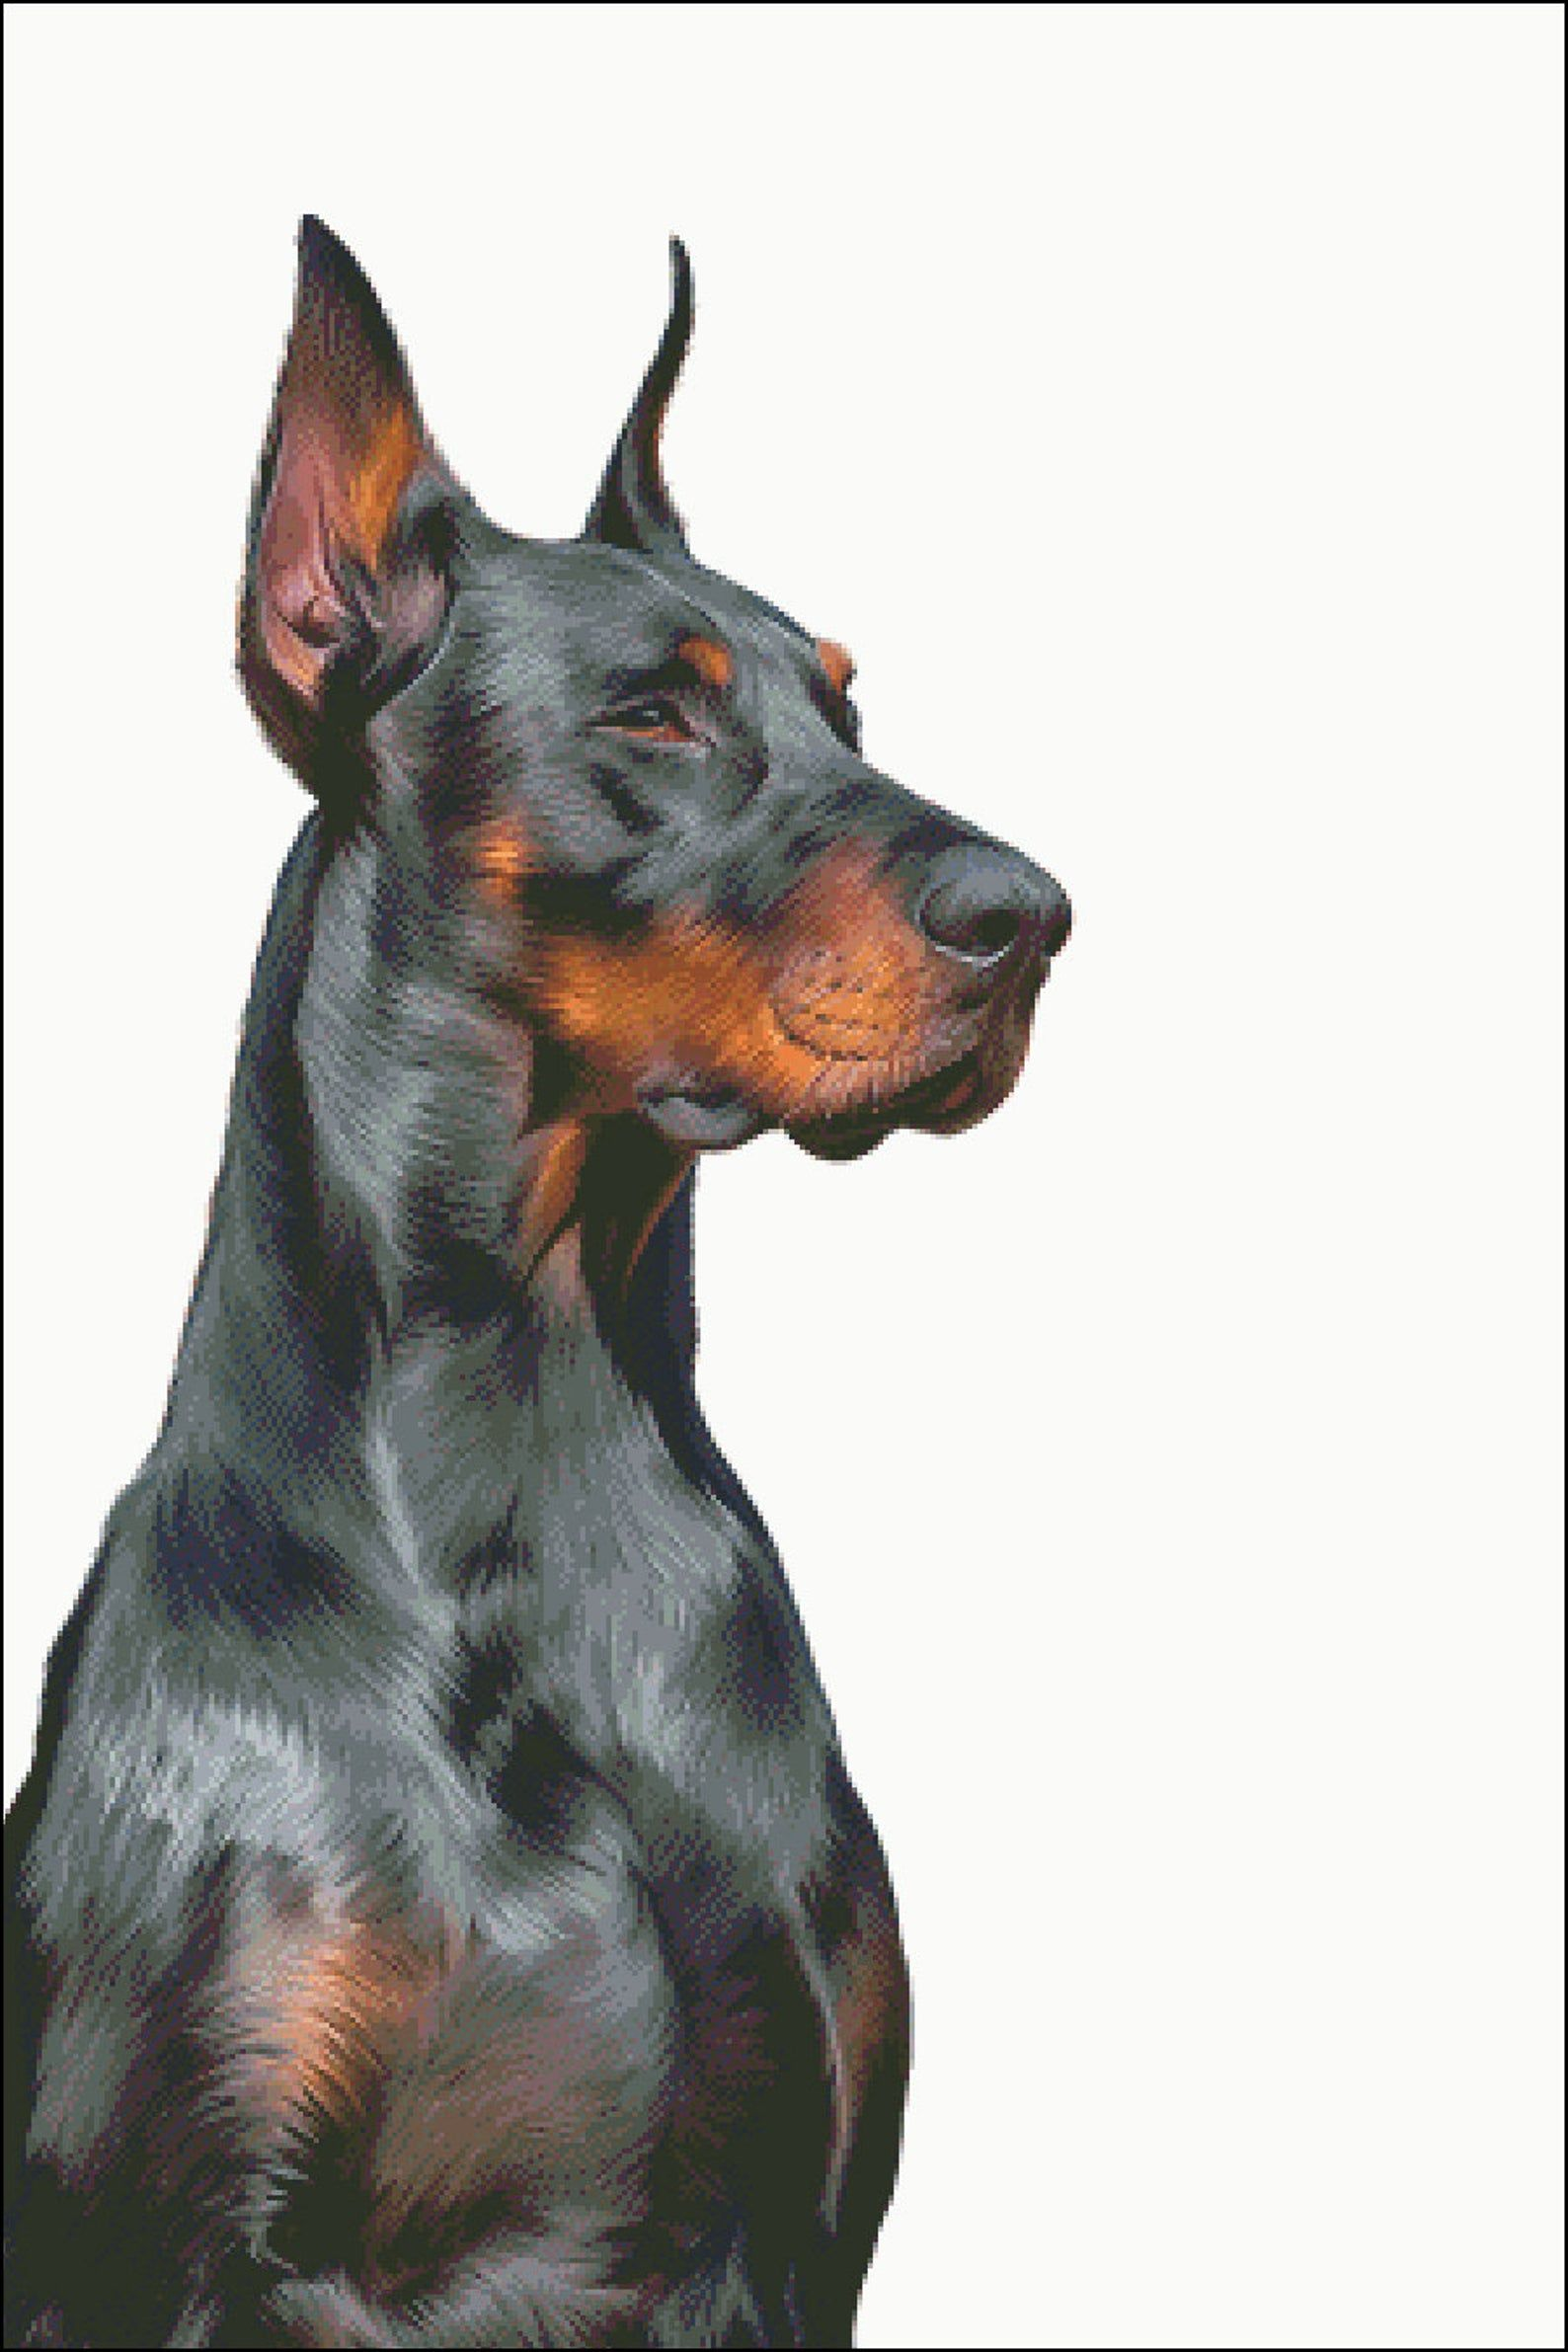 Doberman Counted Cross Stitch Pattern Etsy In 2020 Doberman Doberman Puppy Doberman Dogs